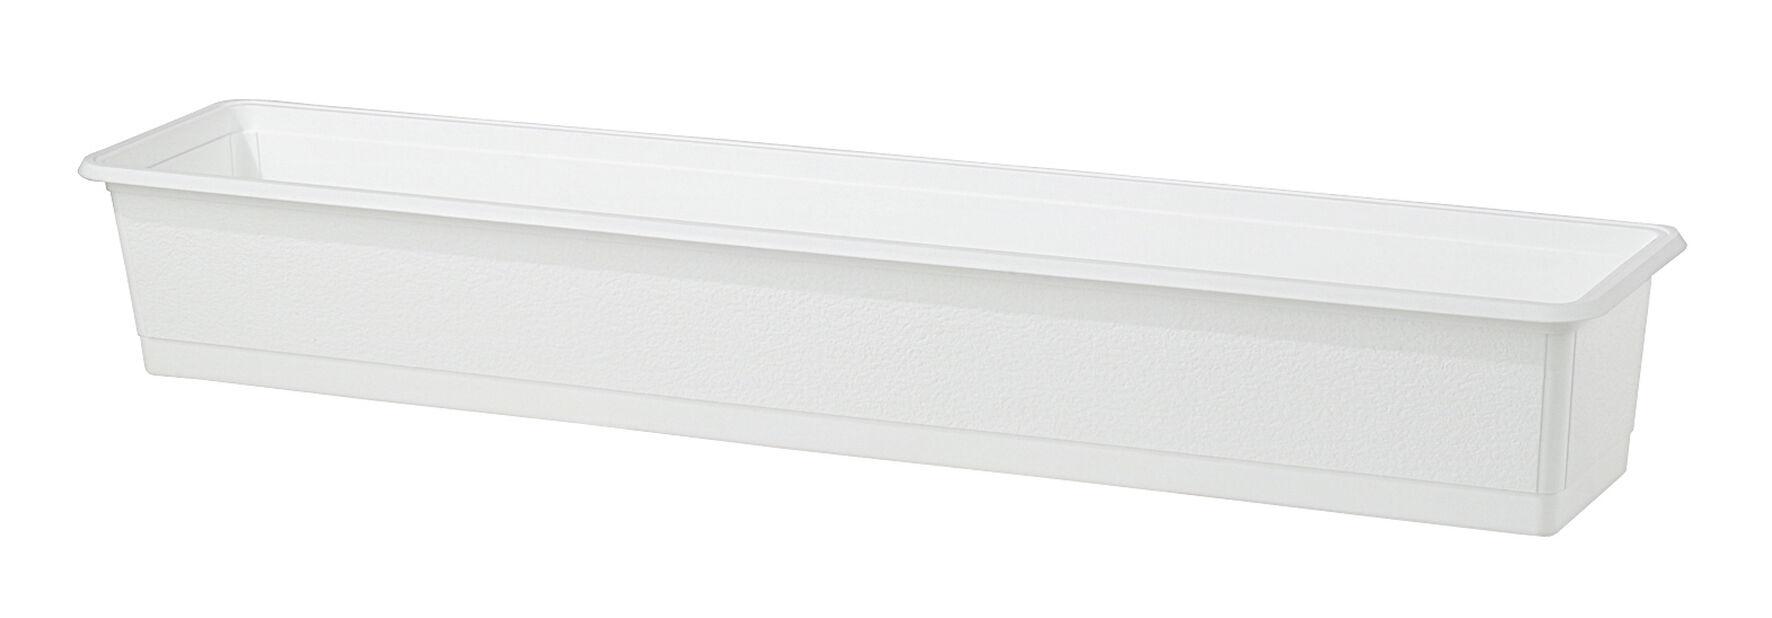 Balkongkasse Structure 70cm hvit